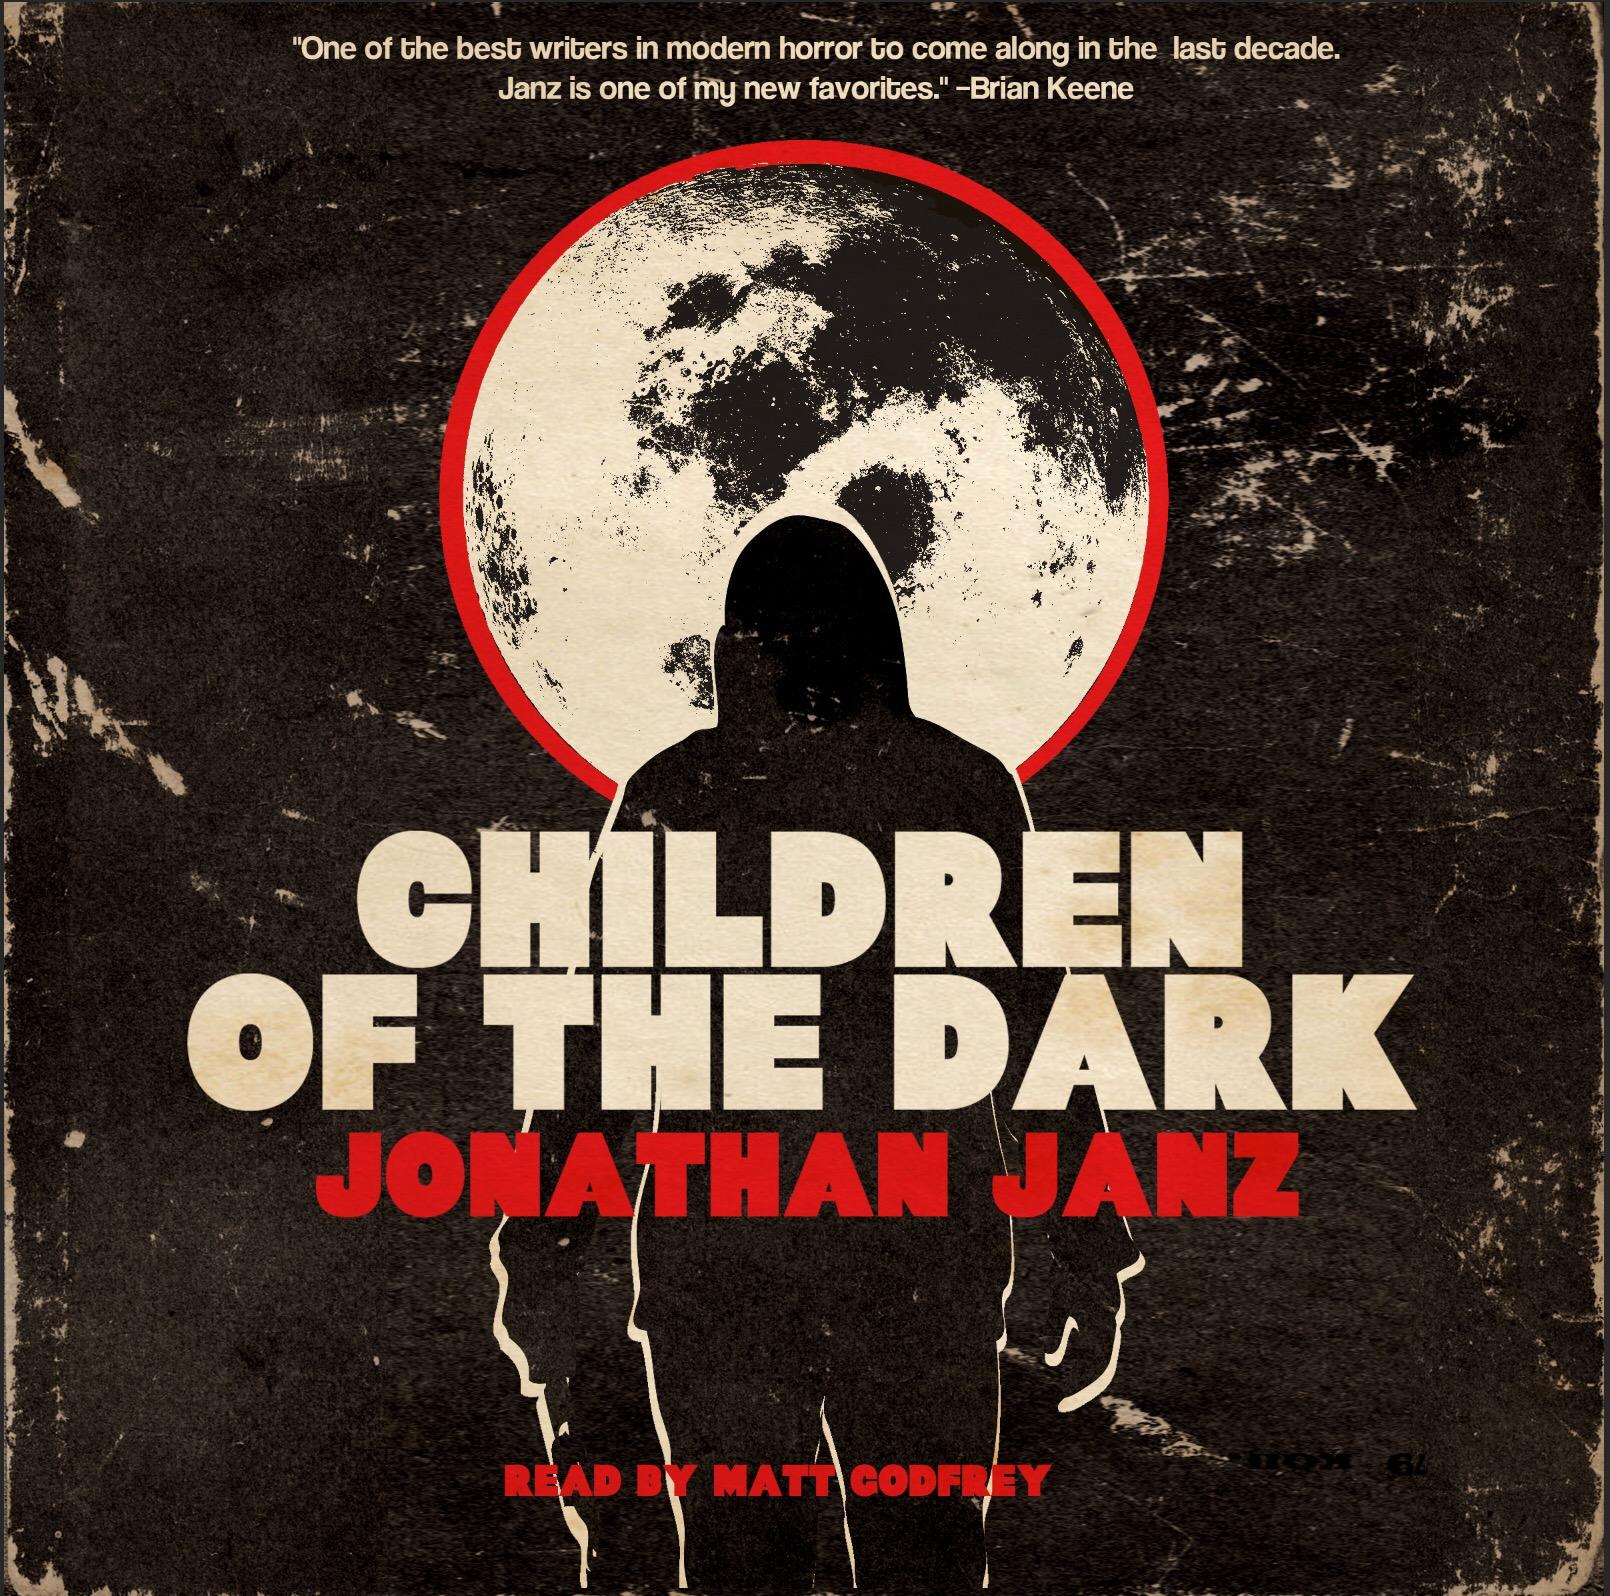 Matt Godfrey - Children of the Dark